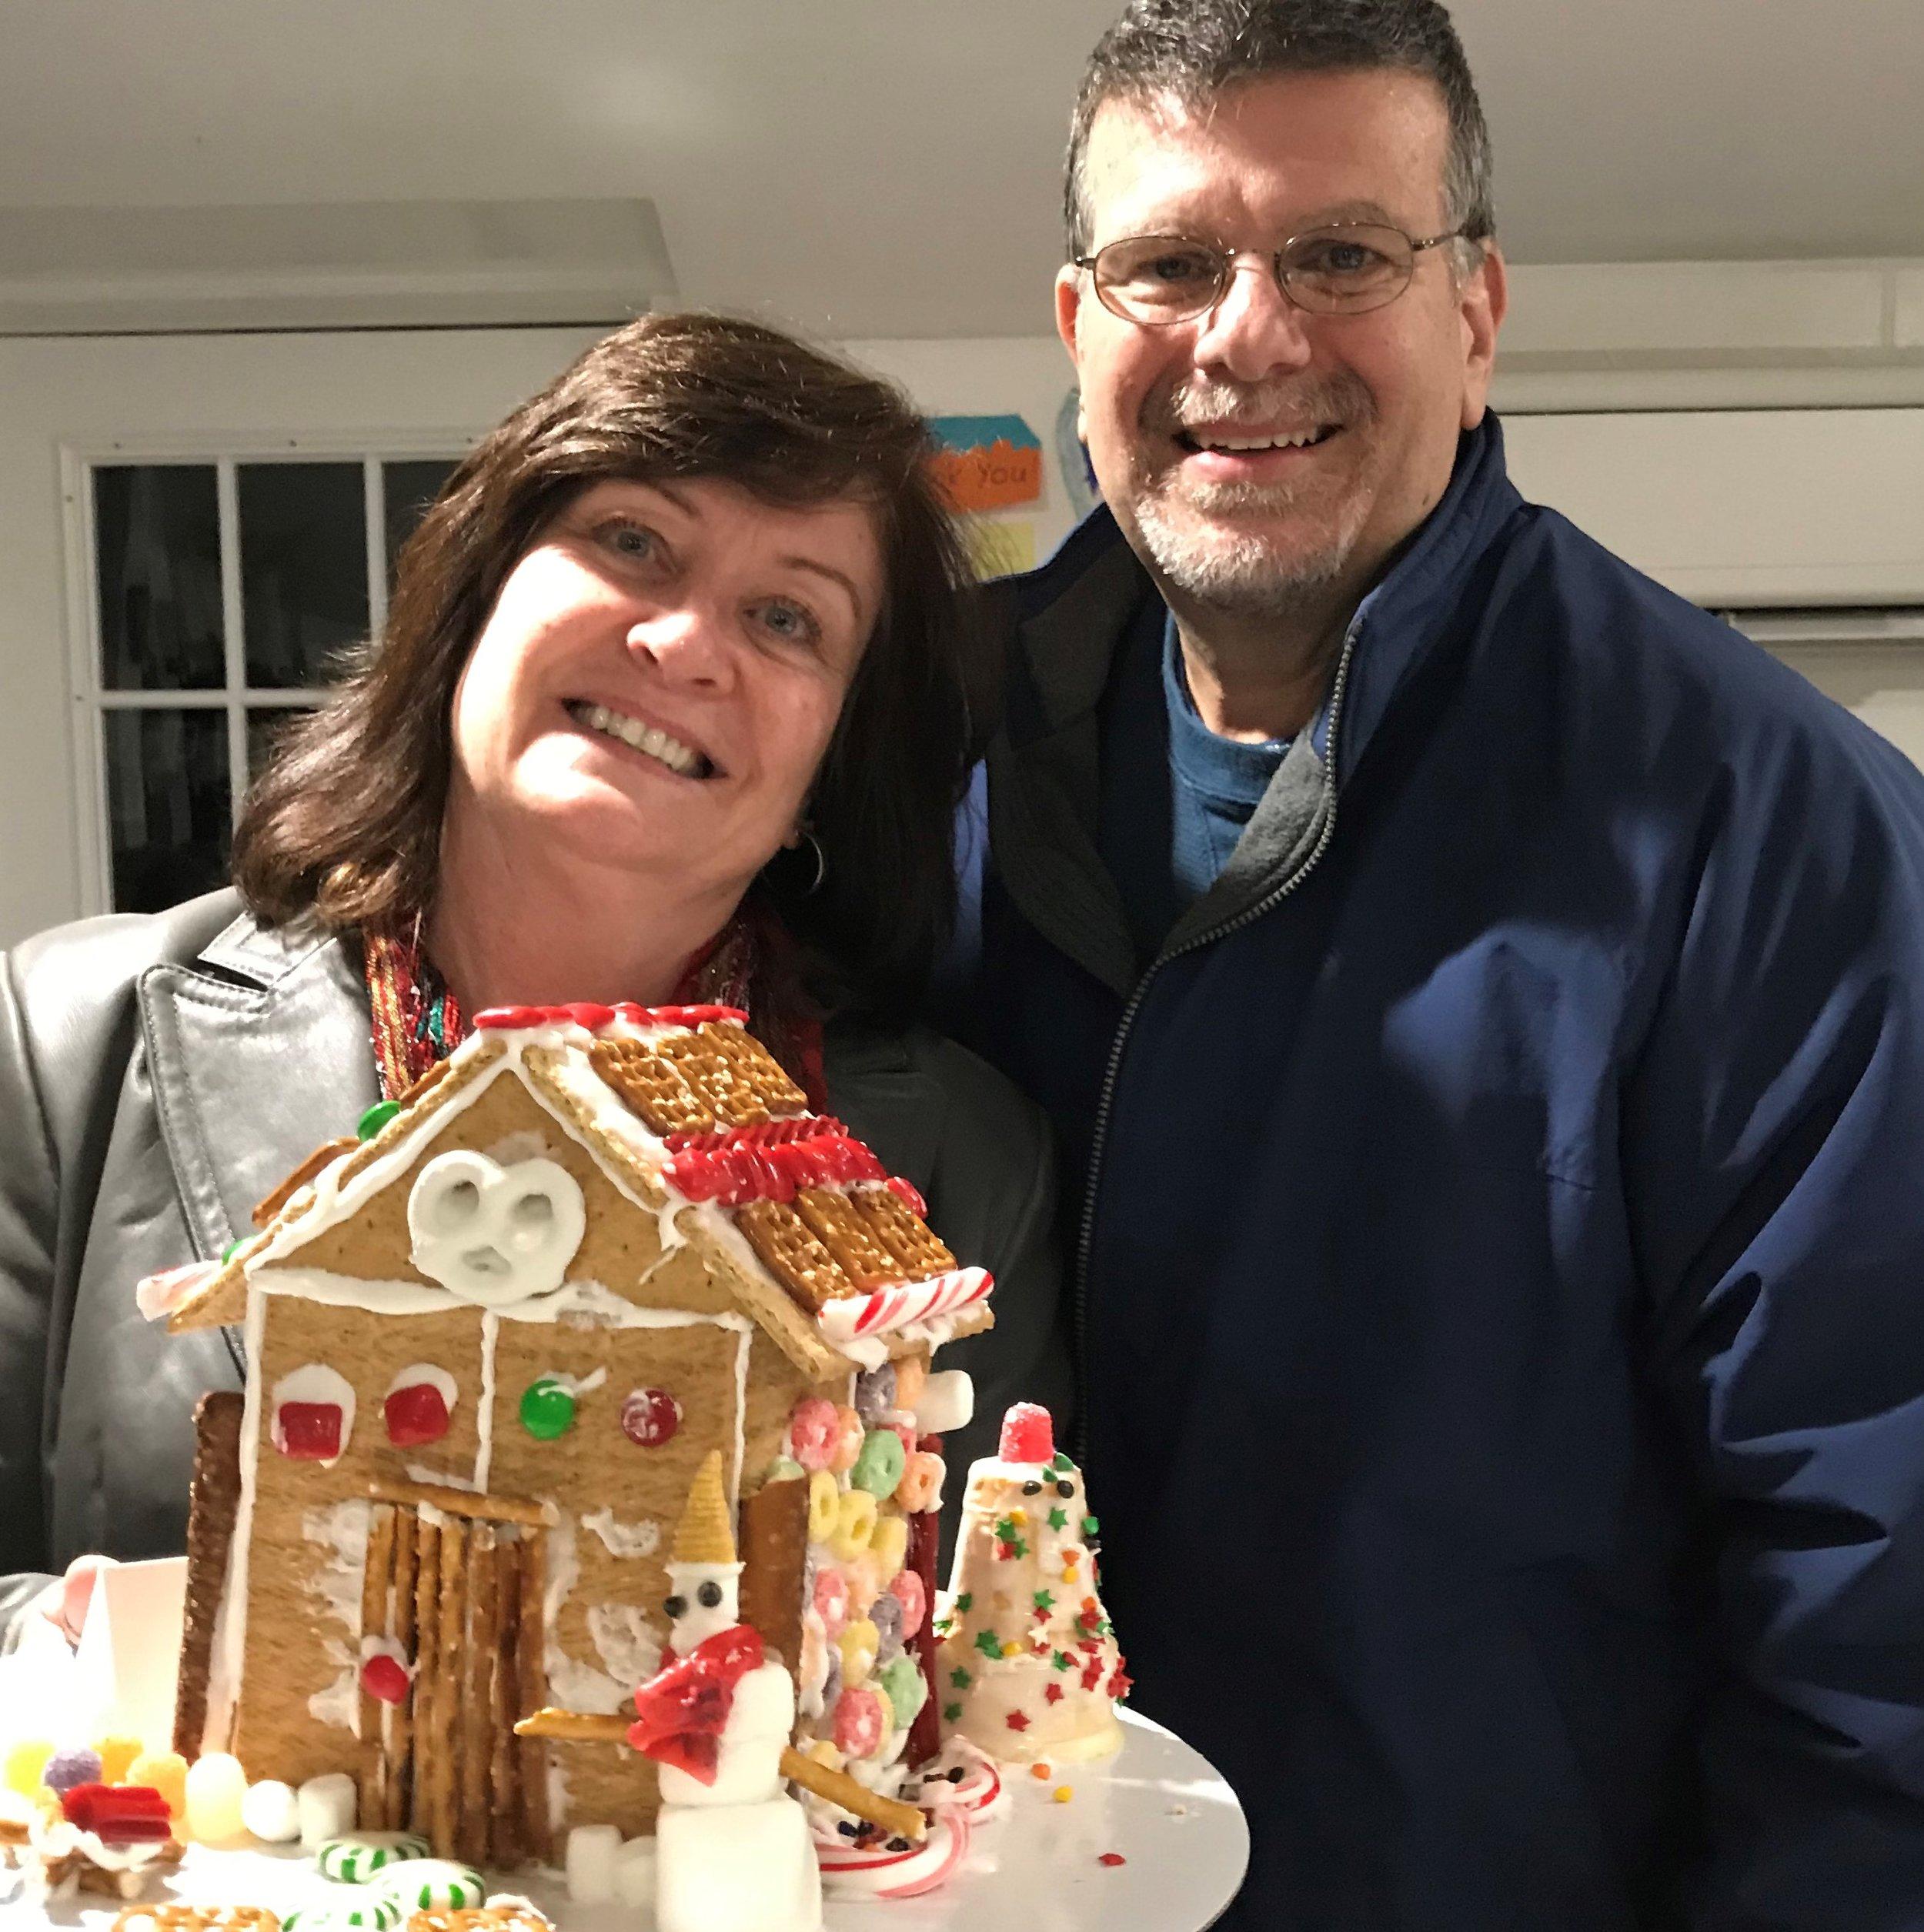 gingerbread house 6.jpeg